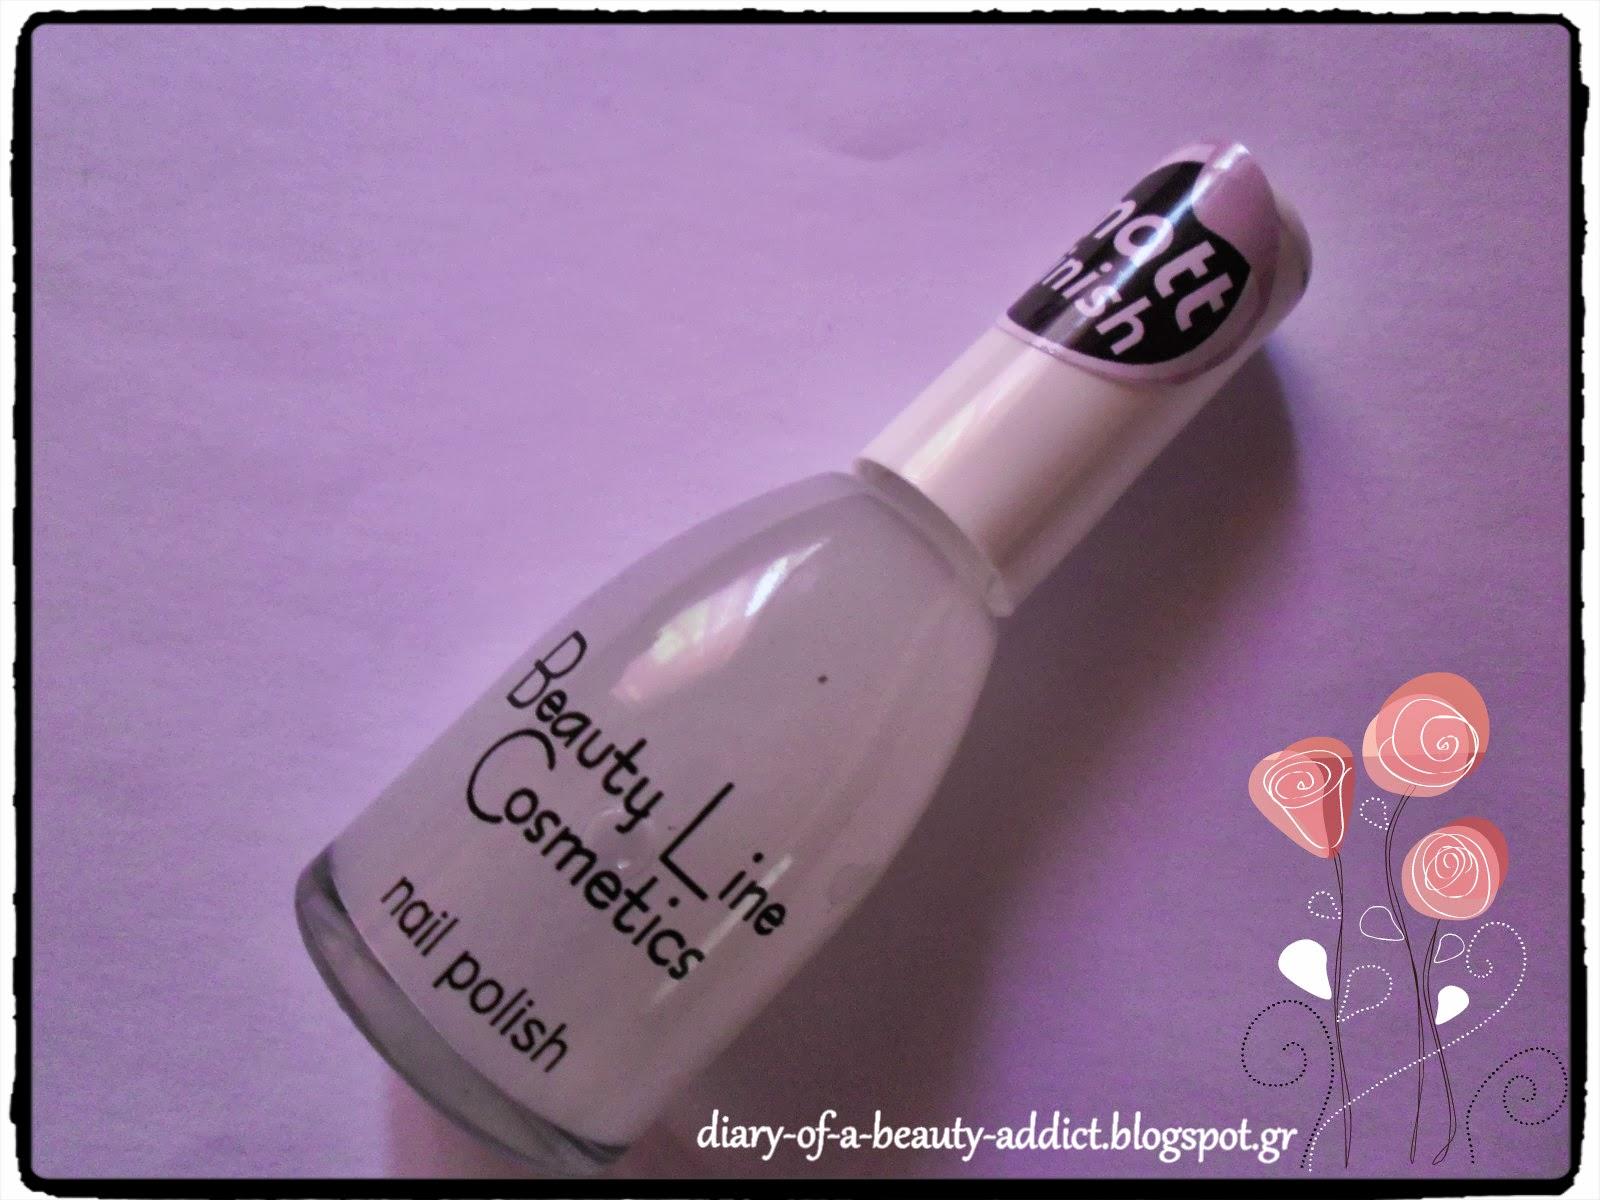 Beauty Line Cosmetics Nail Polish/Matt Finish